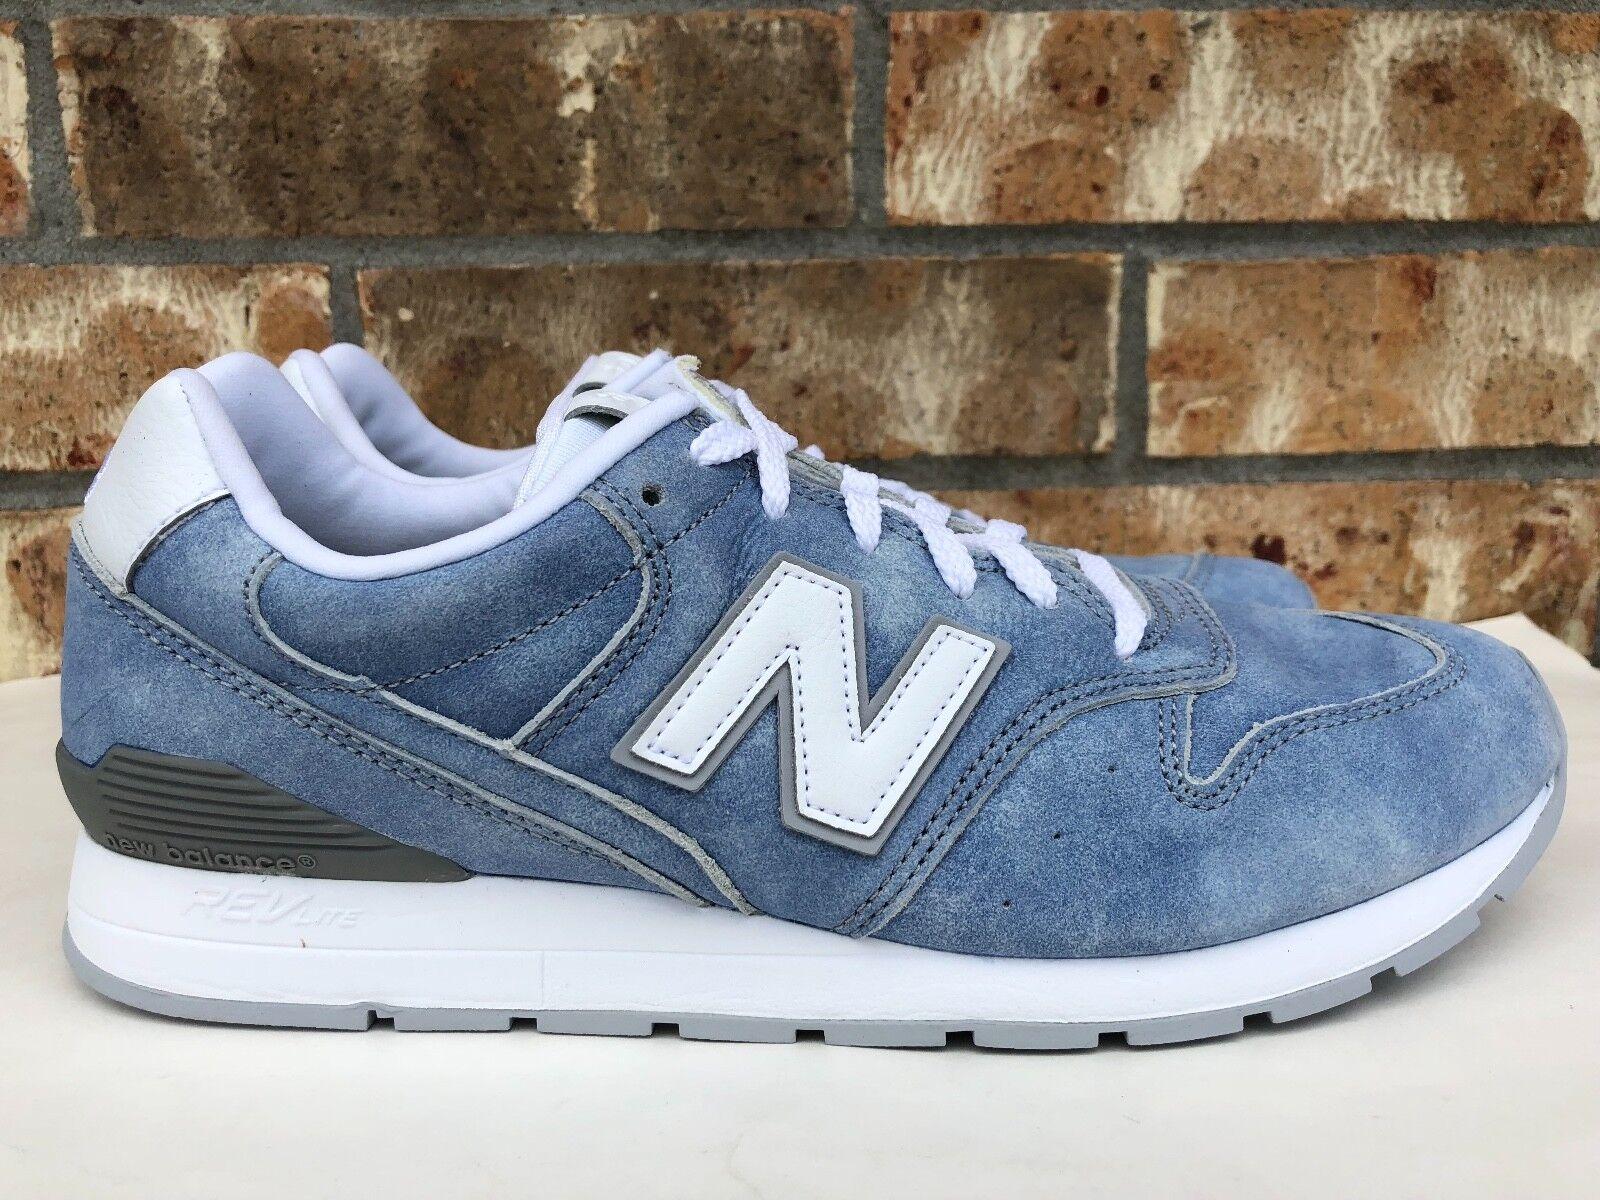 Para hombres 996 Revlite FL luz New Balance Azul blancoo Running Zapatos MRL996JX